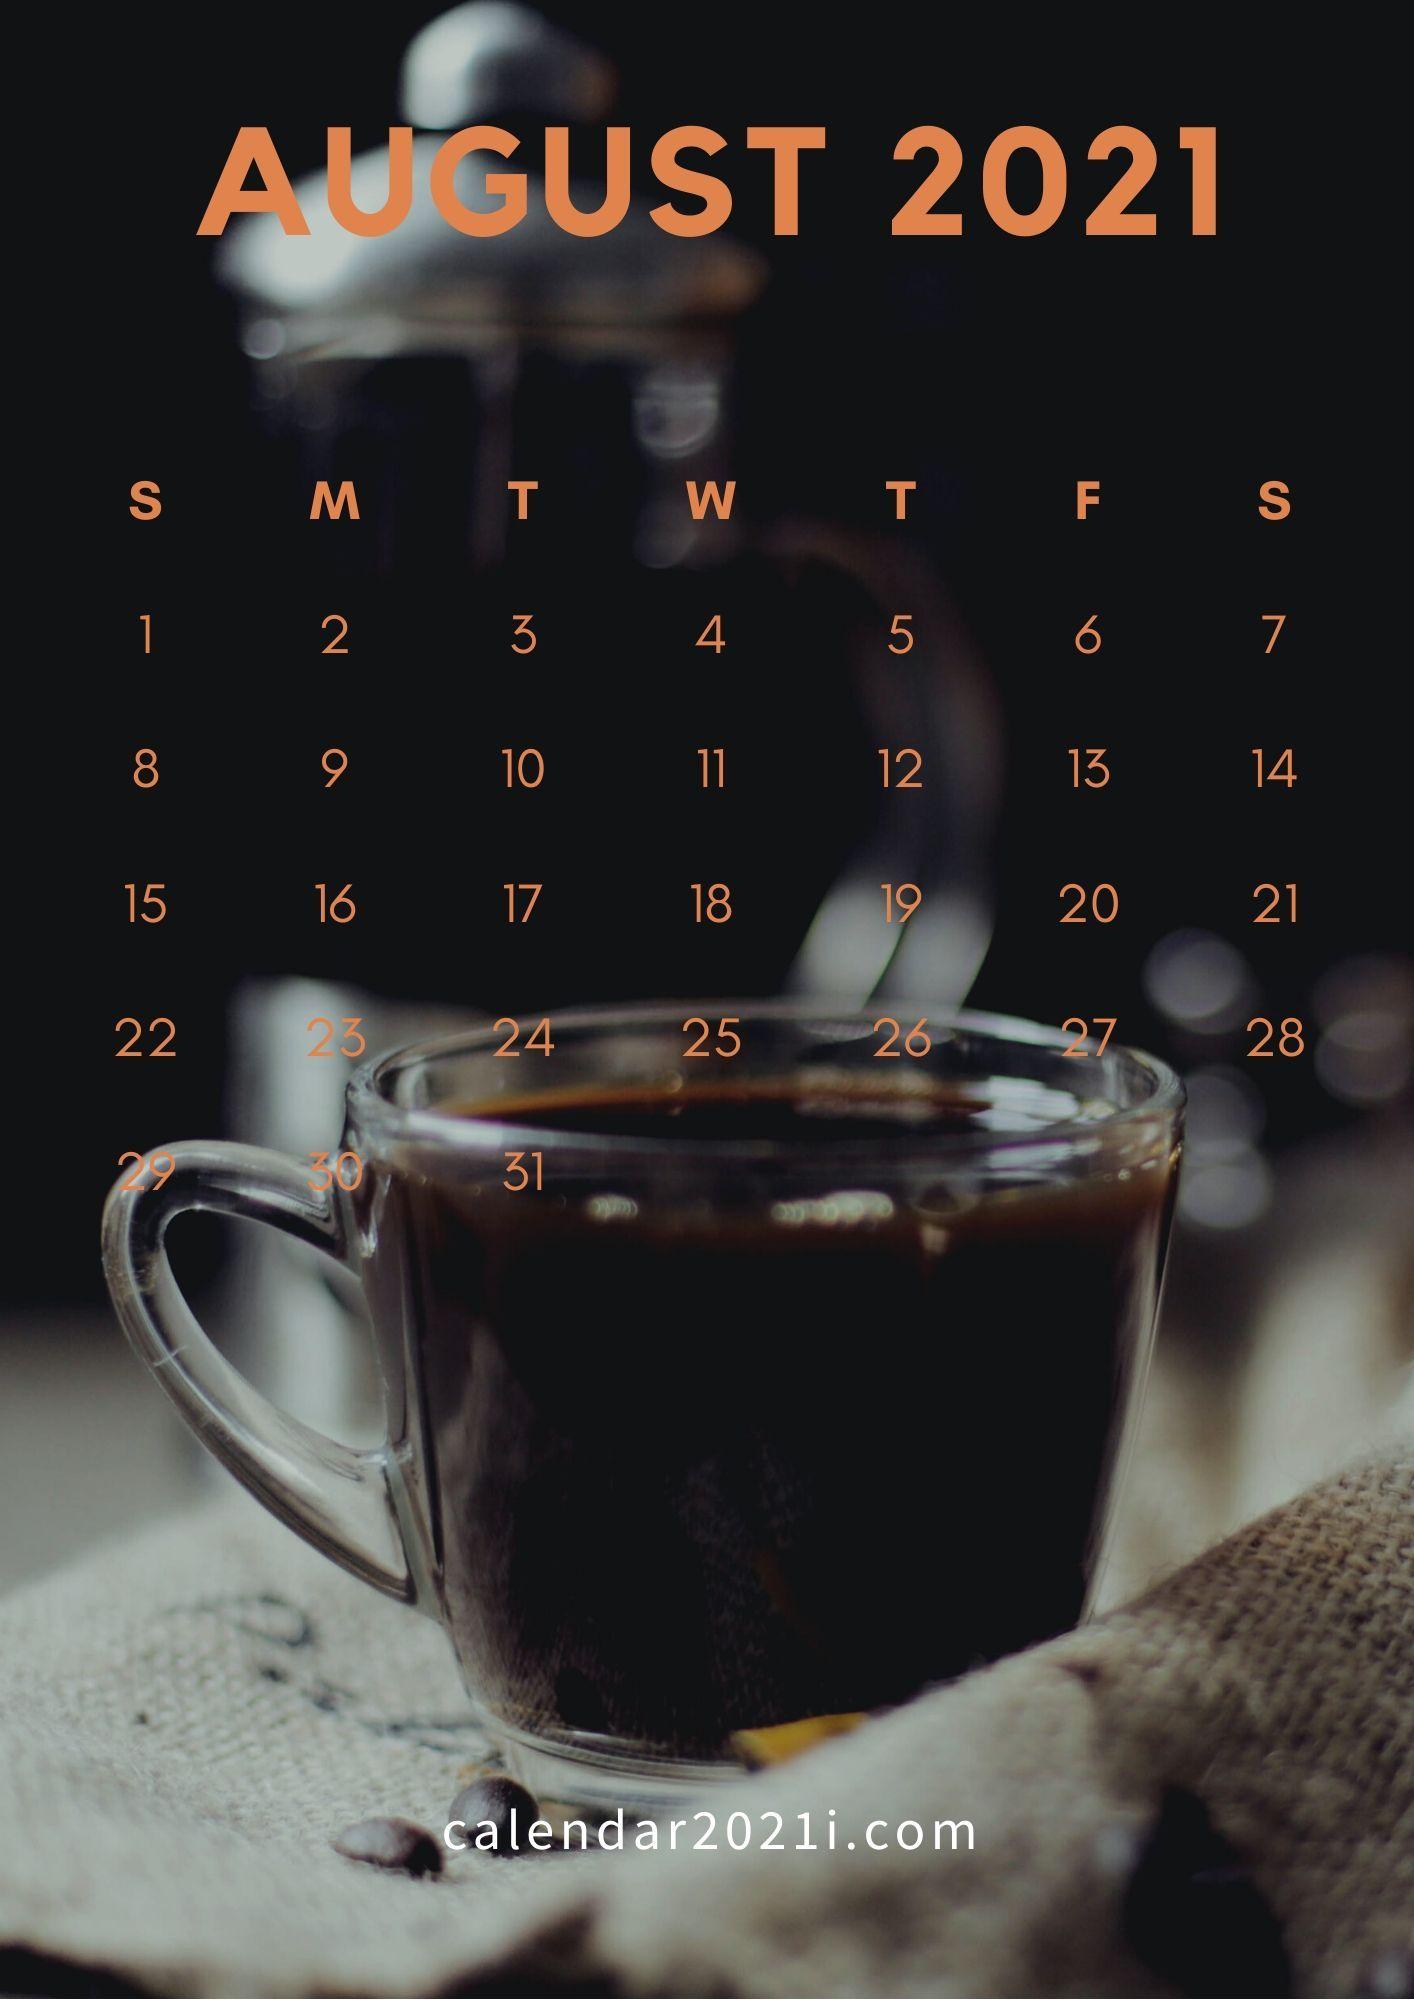 iPhone 2021 Calendar HD Wallpapers Calendar 2021 in 2021 1414x2000